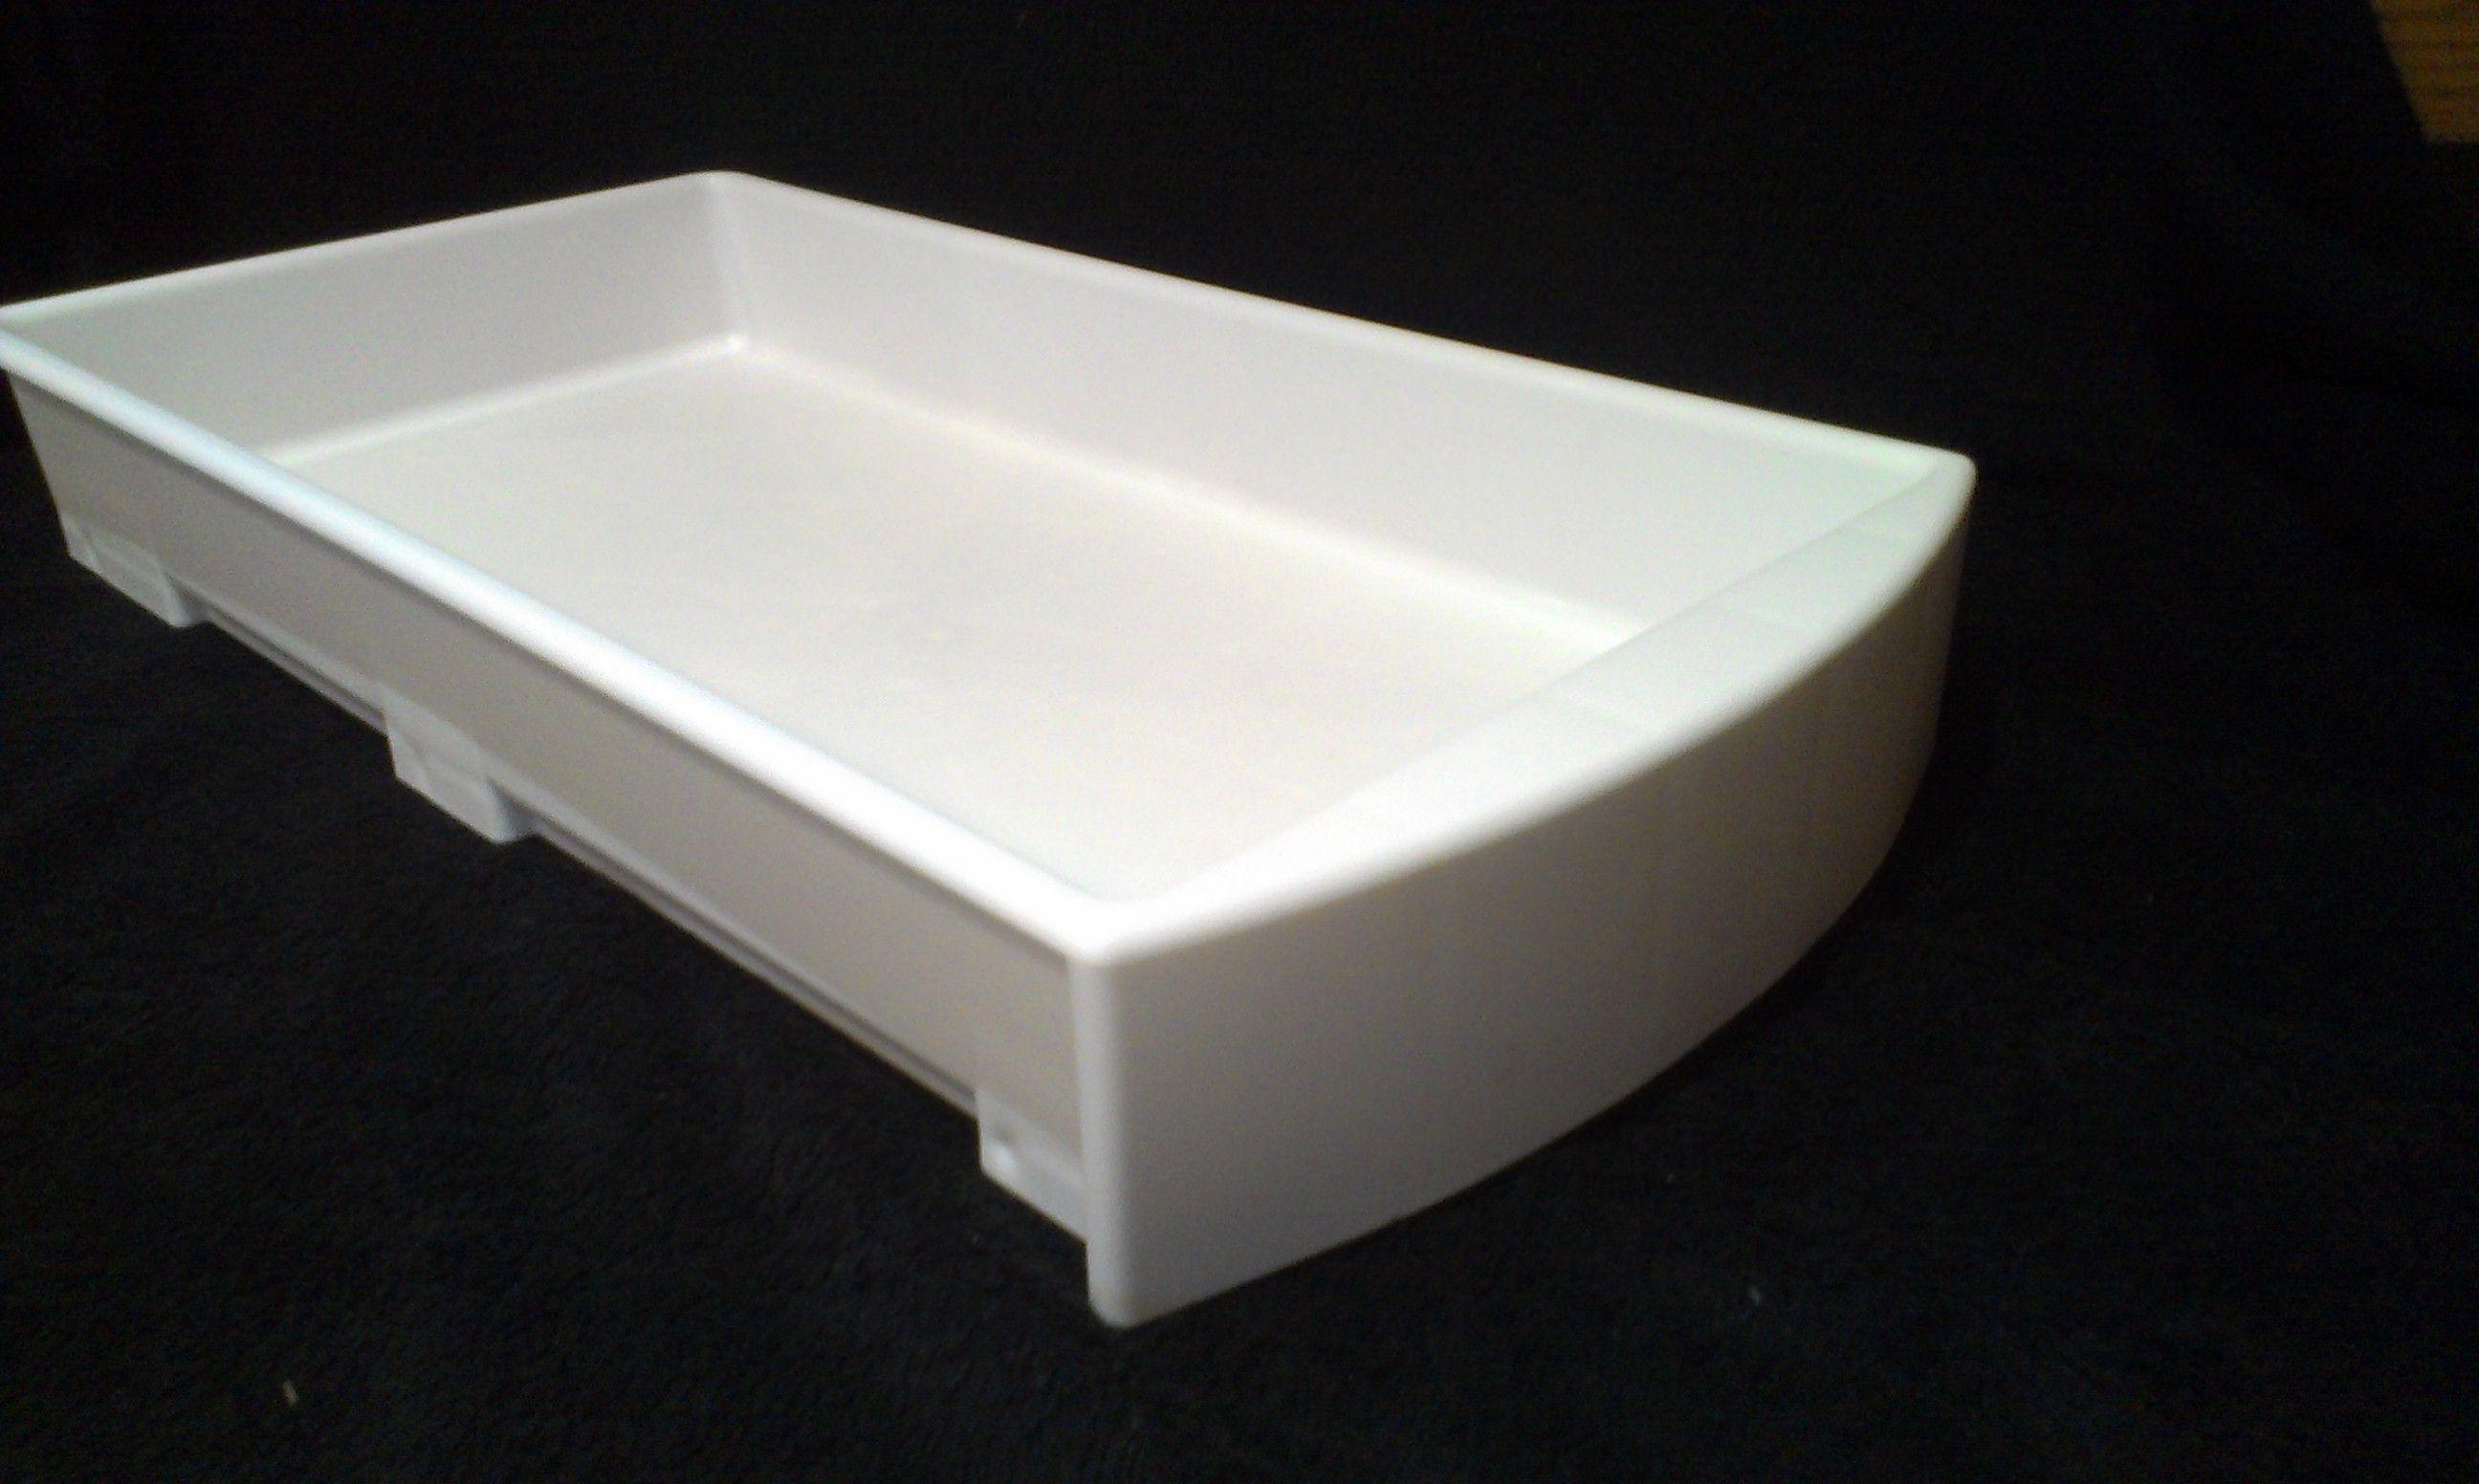 Plastic Cabinet Drawers | Diy blinds, Kitchen cabinet ...